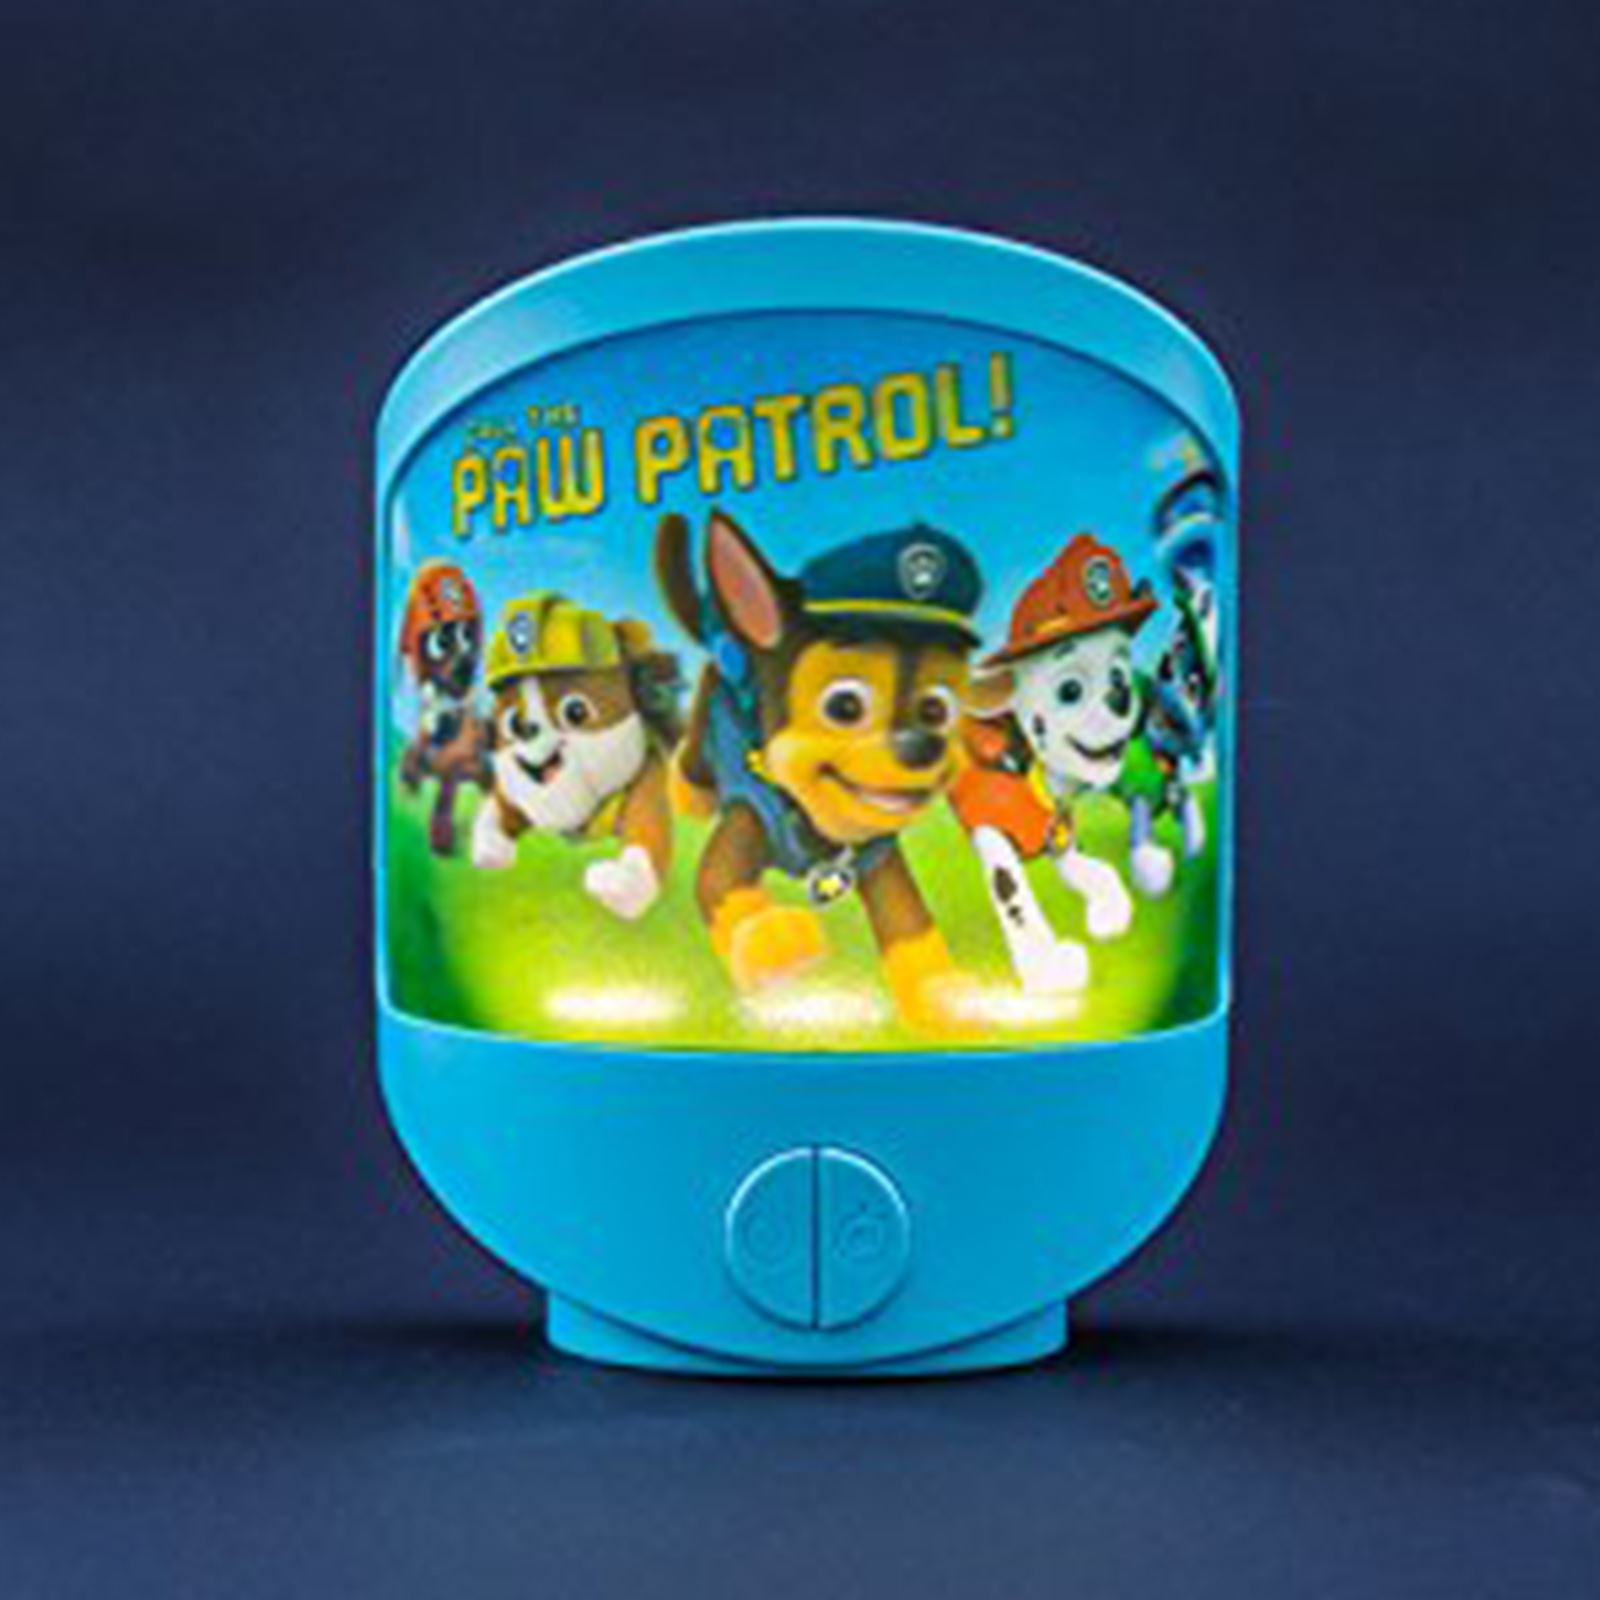 PAW PATROL SHIMMER /& SHINE LENTICULAR MULTI FUNCTION NIGHT LIGHTS PEPPA PIG